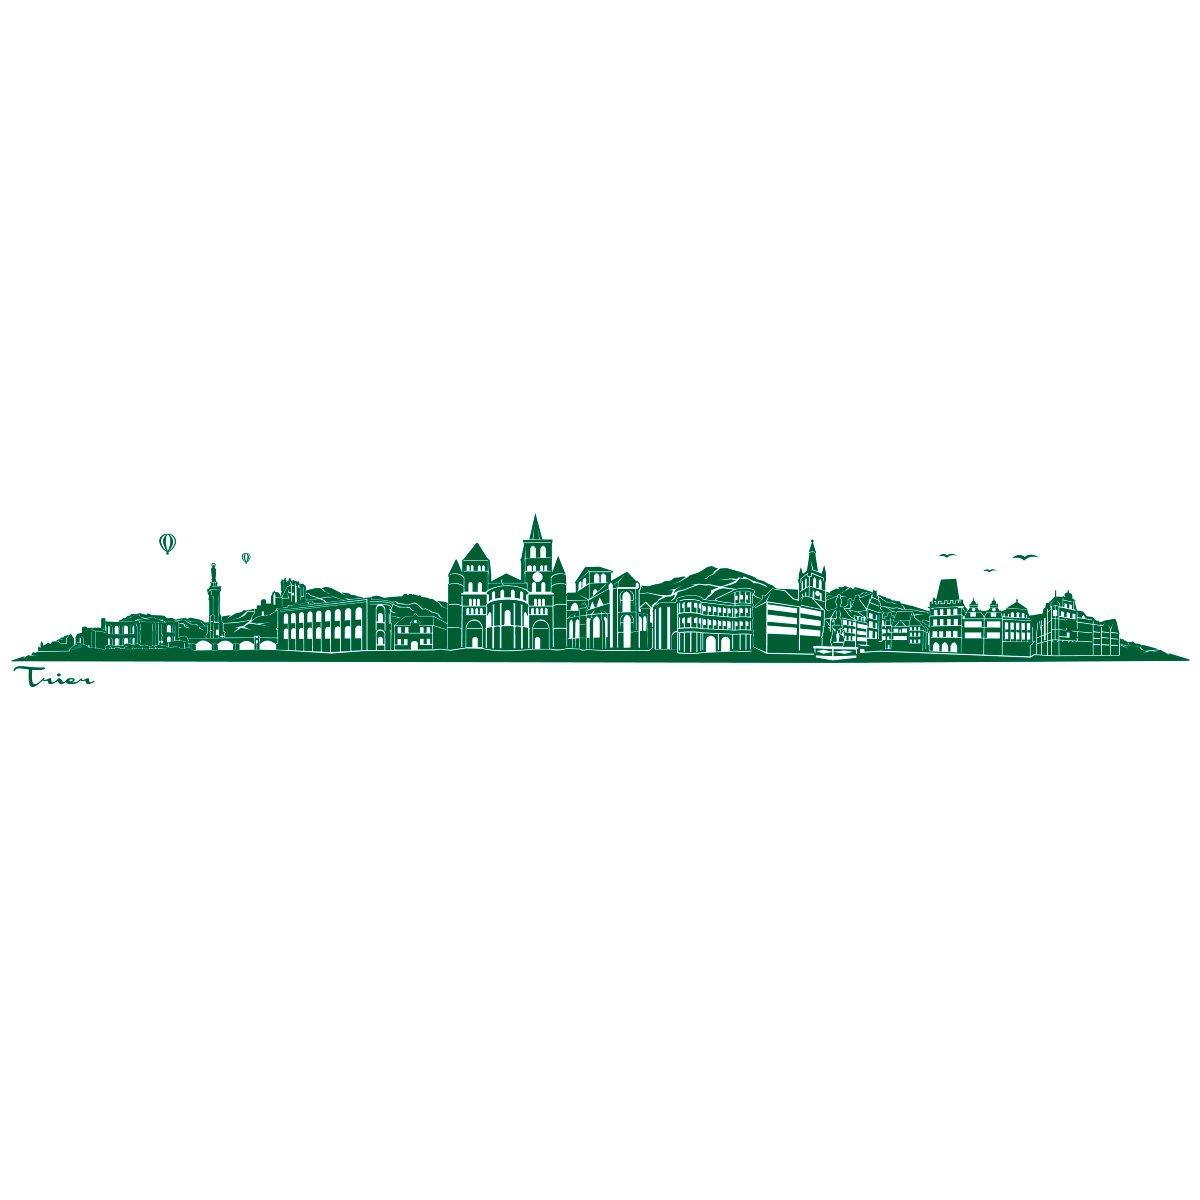 WANDKINGS Wandtattoo - Skyline Trier (ohne Fluss) - 240 x x x 36 cm - Schwarz - Wähle aus 6 Größen & 35 Farben B078SC42H1 Wandtattoos & Wandbilder 9dfdca